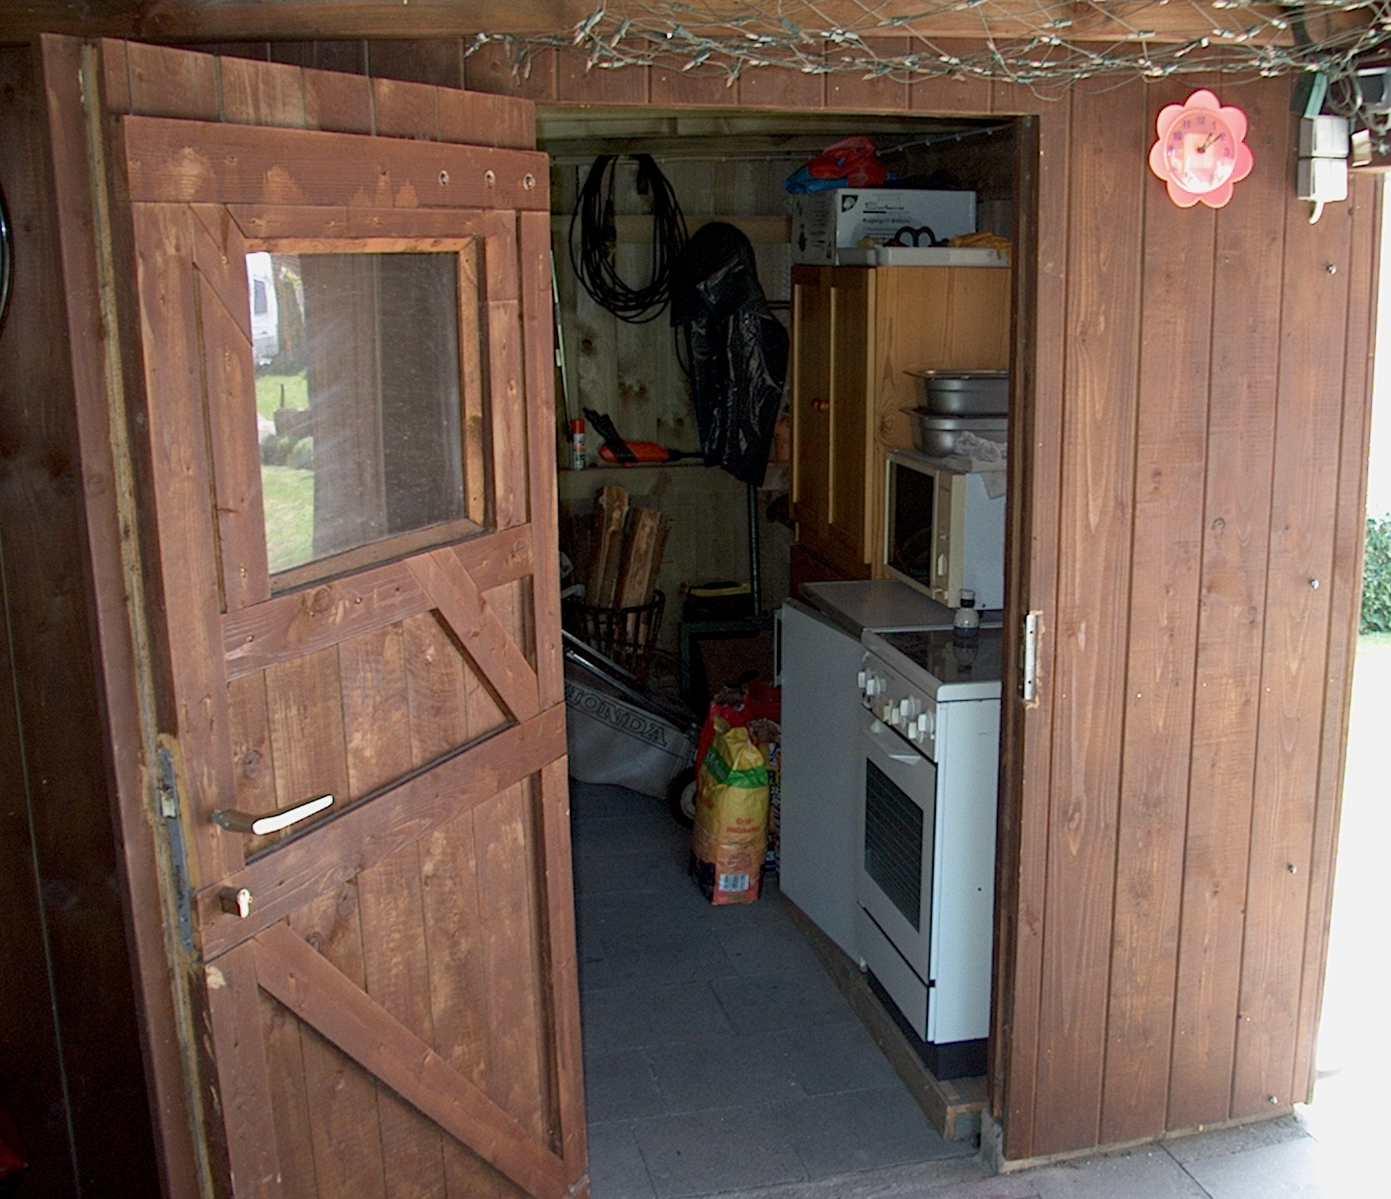 eigenbau:kombinierter back/-räucherofen, outdoor küche, etc